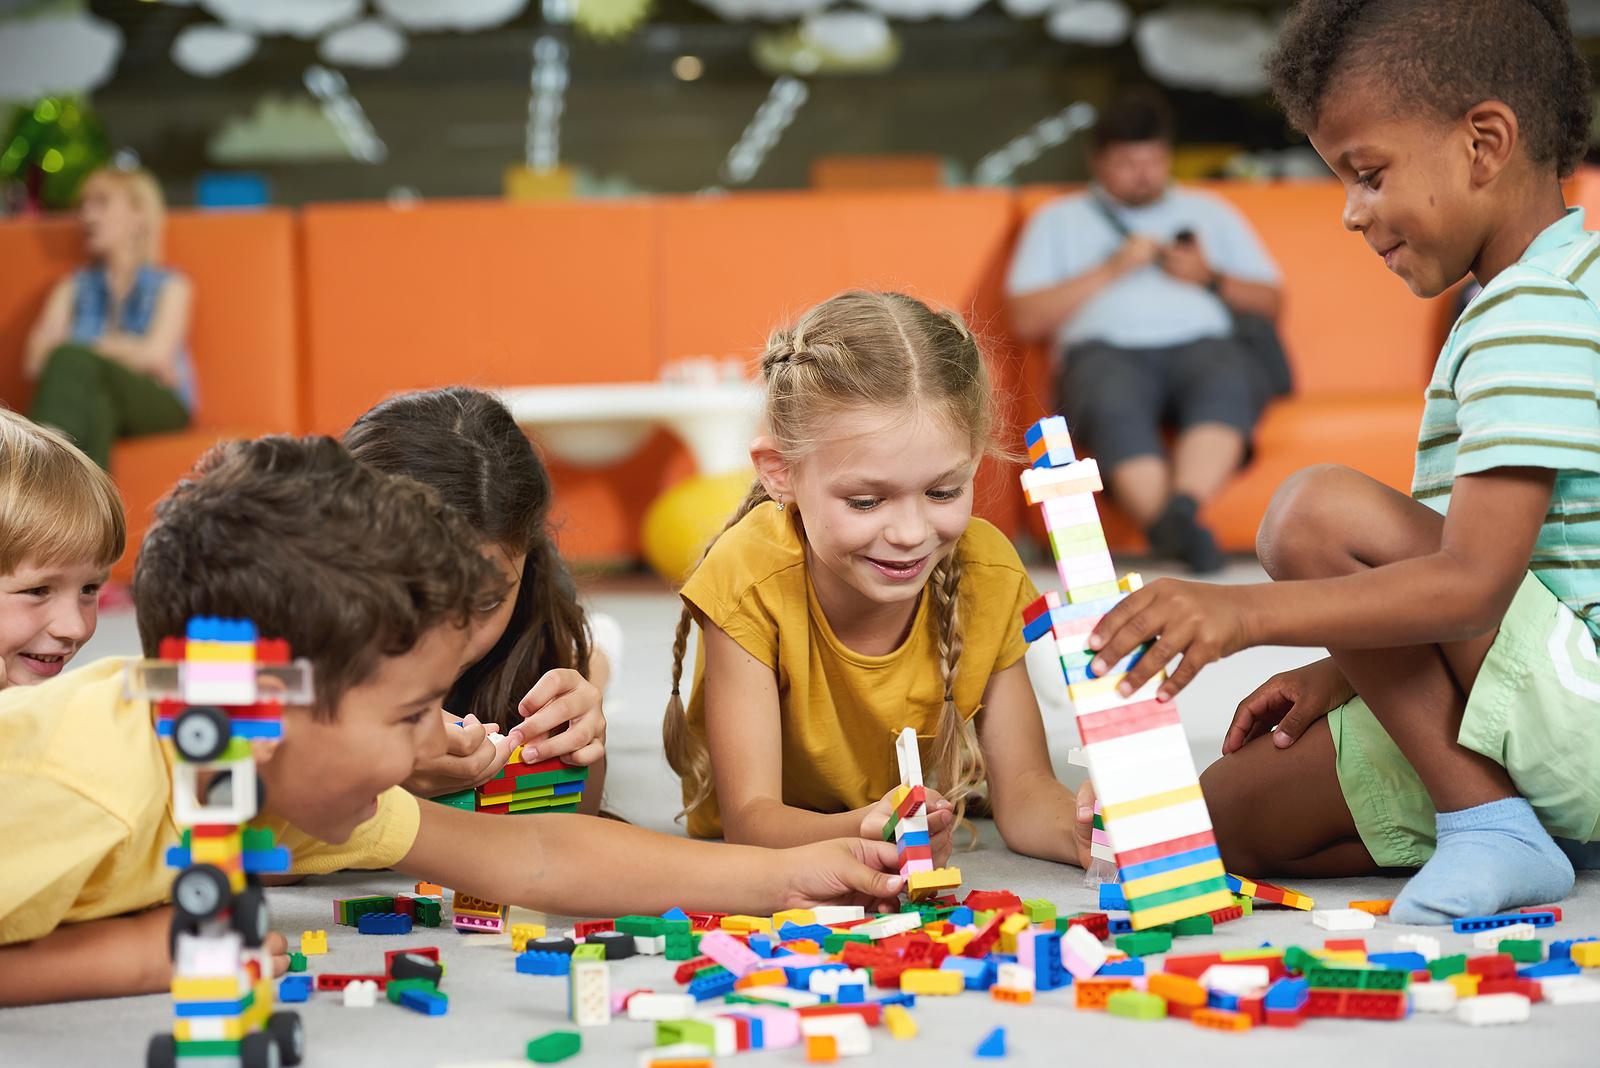 Children building with blocks